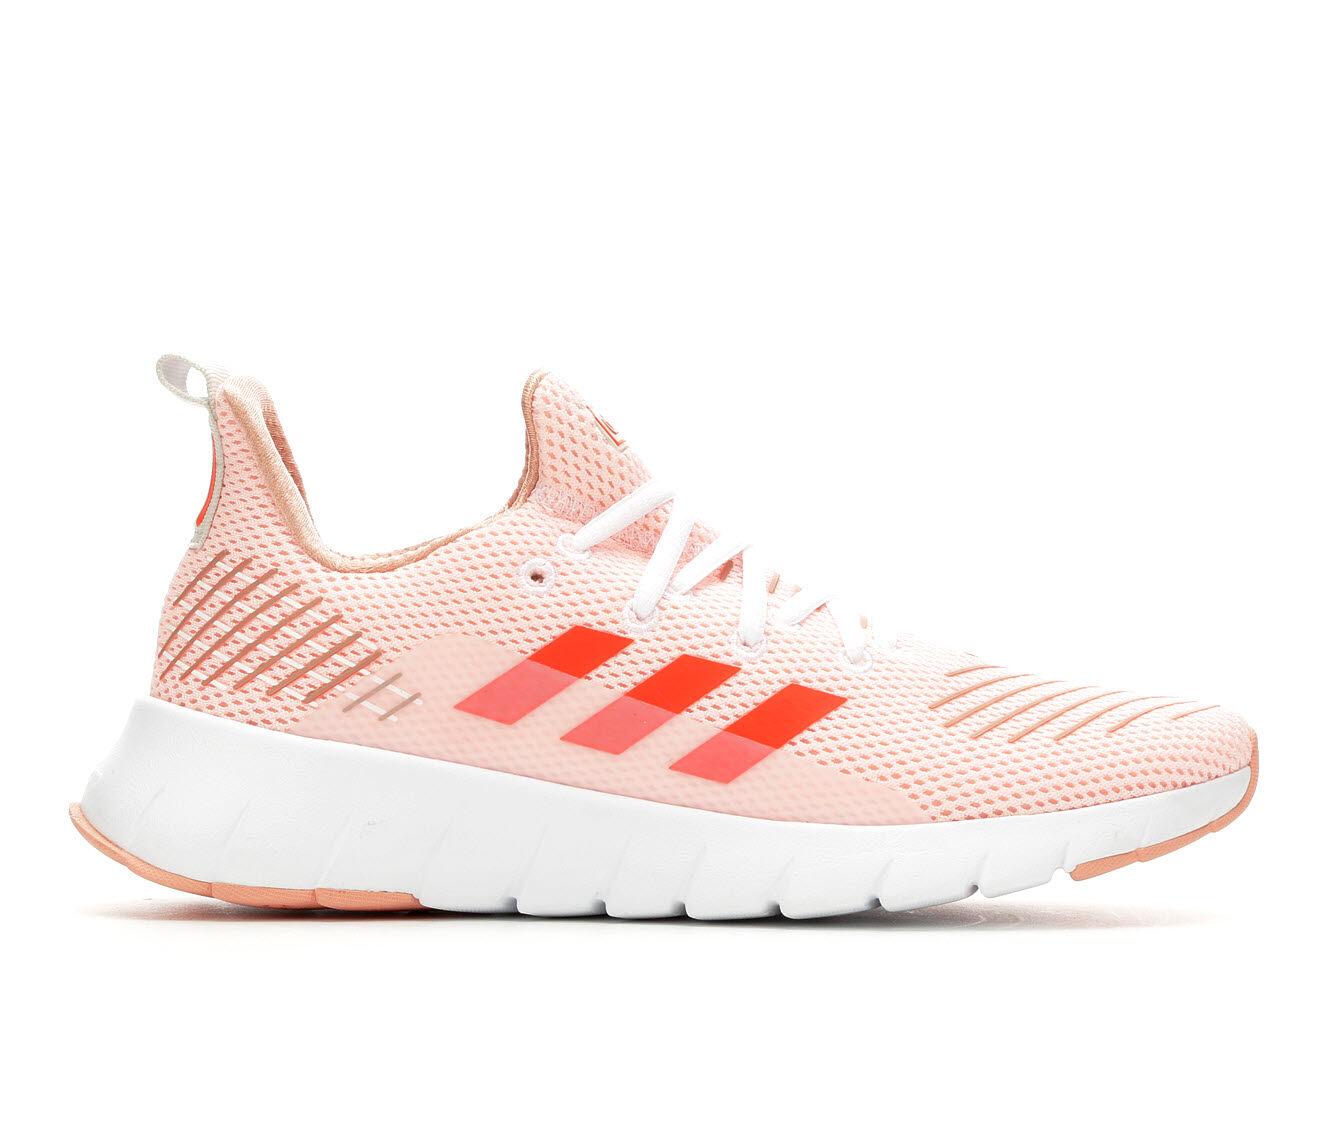 Women's Adidas Asweego Run Running Shoes Orange/Red/Wht